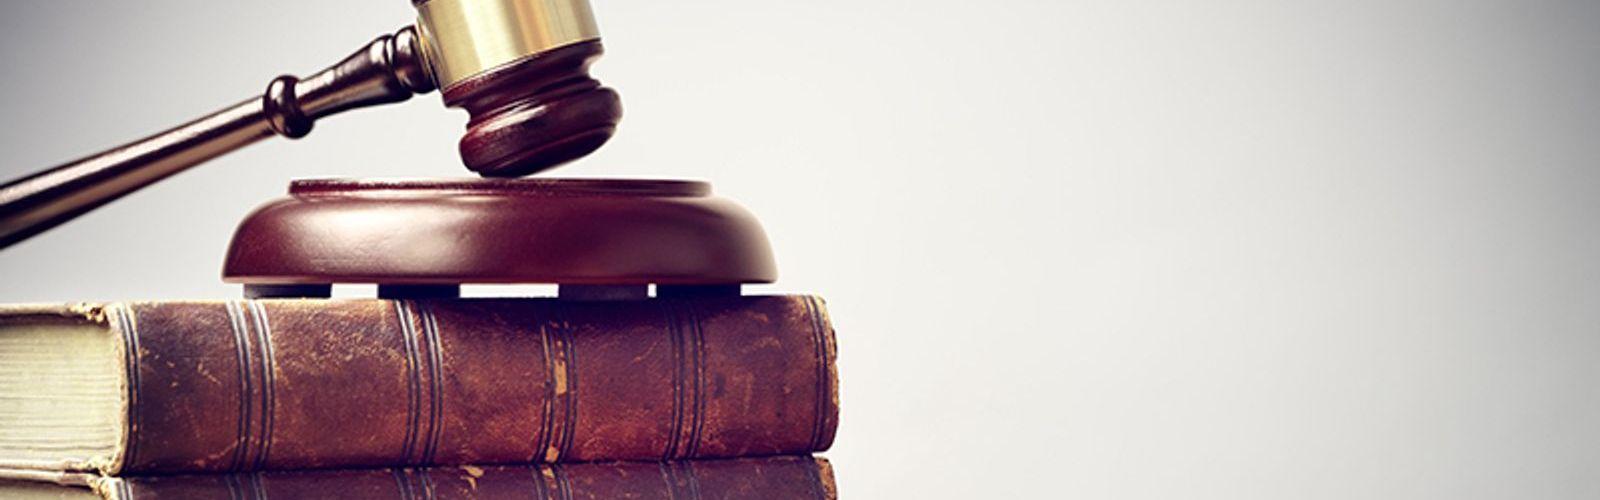 Judge and gavel (bs344423611).jpg